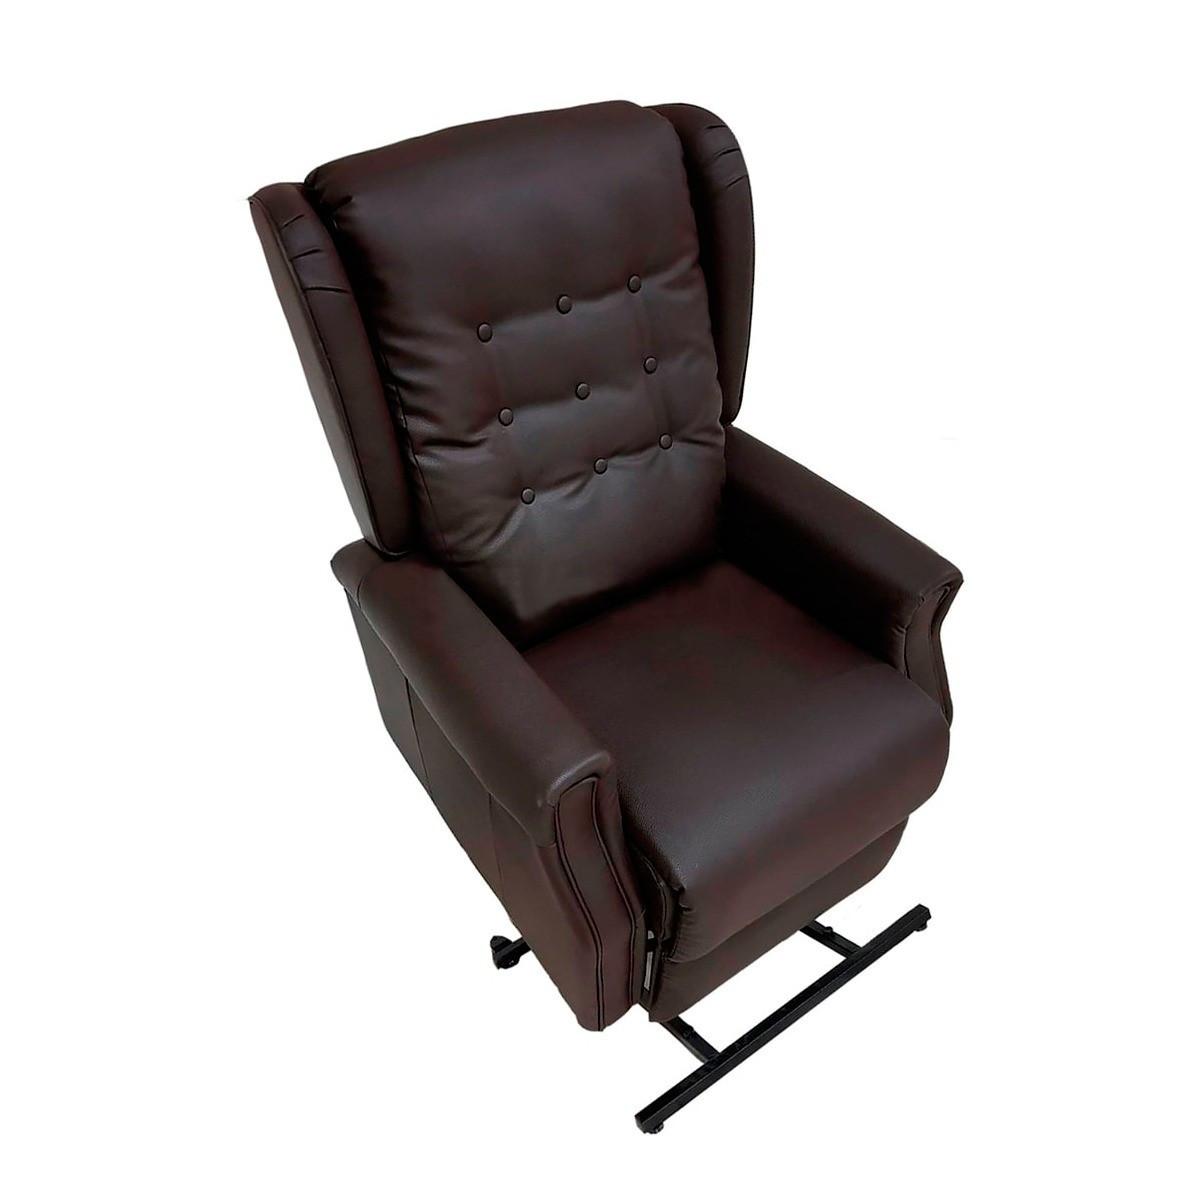 Массажное кресло реклайнер LOW-END класса OTO LIFT CHAIR LC-800